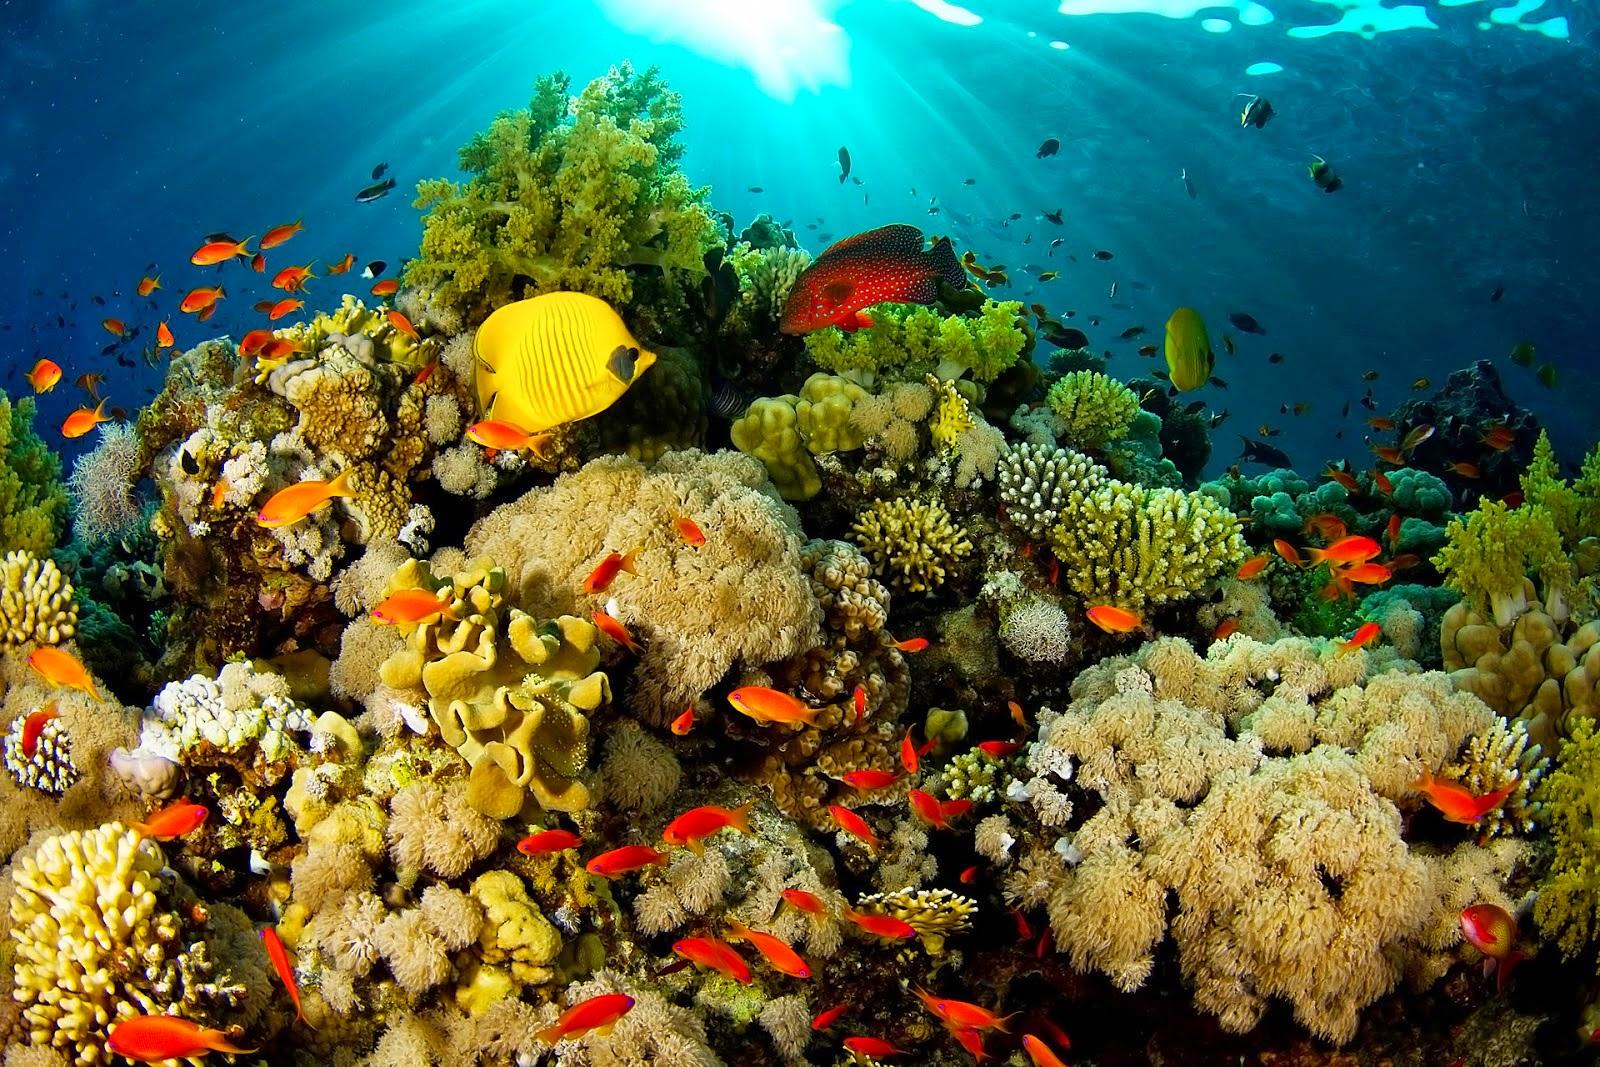 Kekayaan laut Raja Ampat | Sumber: Good News From Indonesia